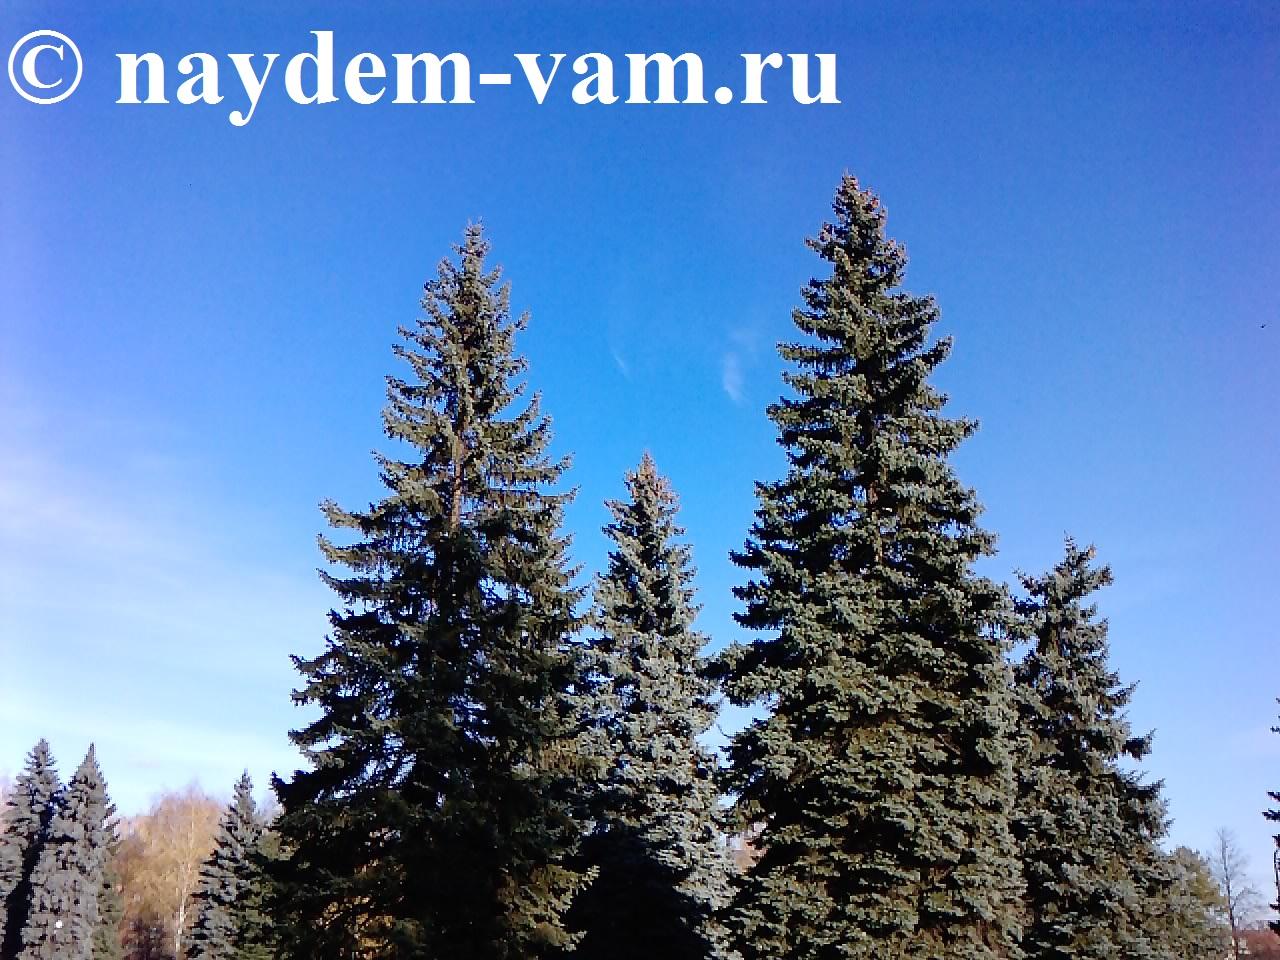 http://s2.uploads.ru/9EuL7.jpg